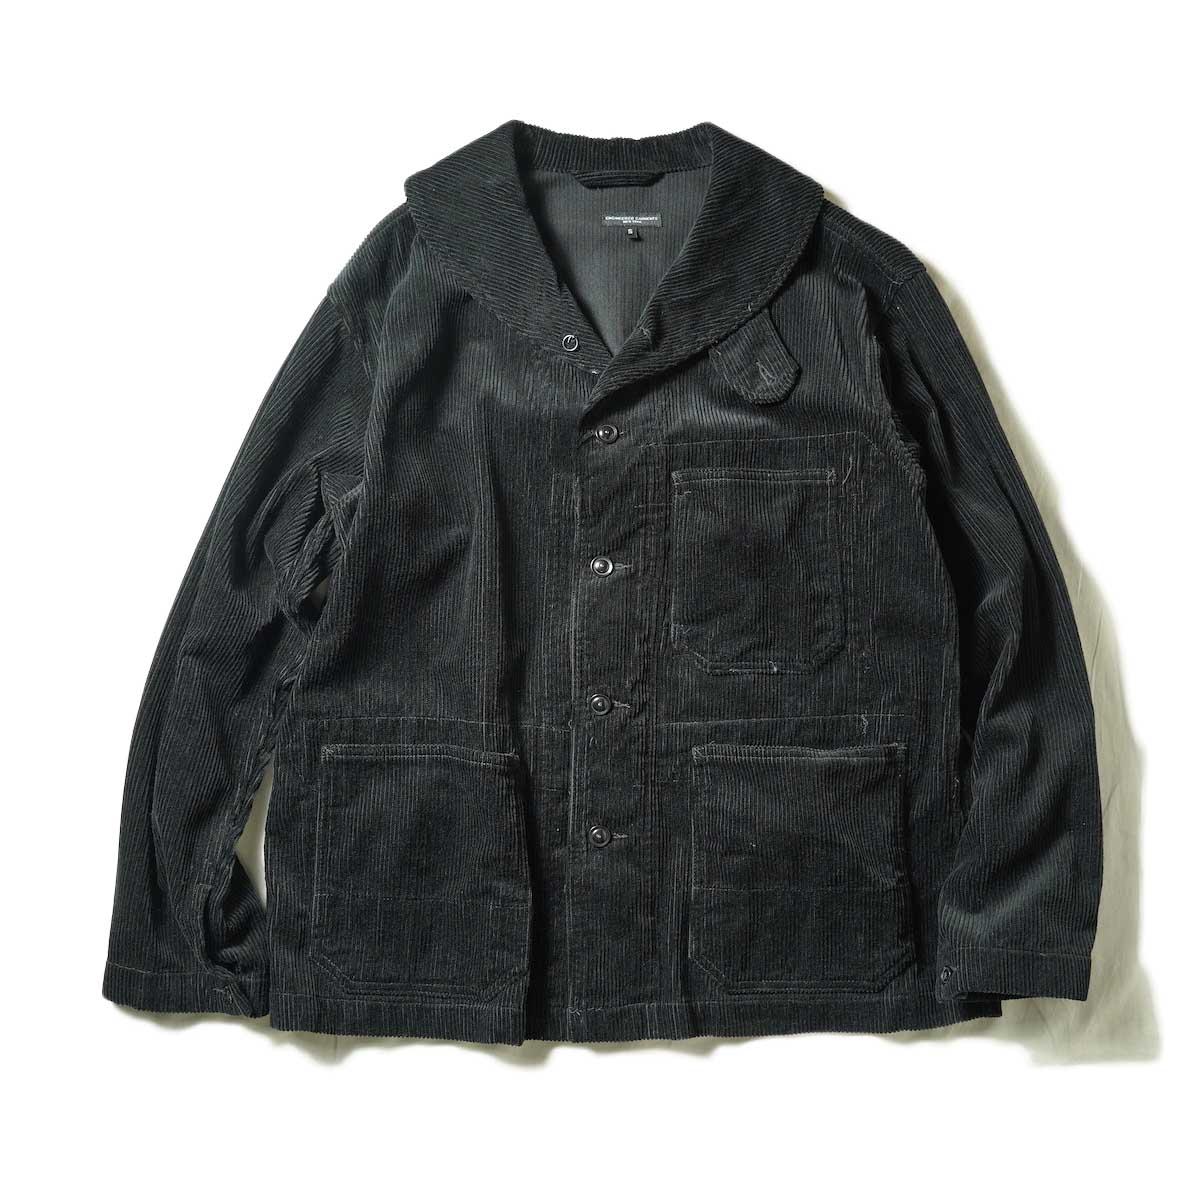 Engineered Garments / SHAWL COLLAR JACKET - COTTON 8W CORDUROY (Black)